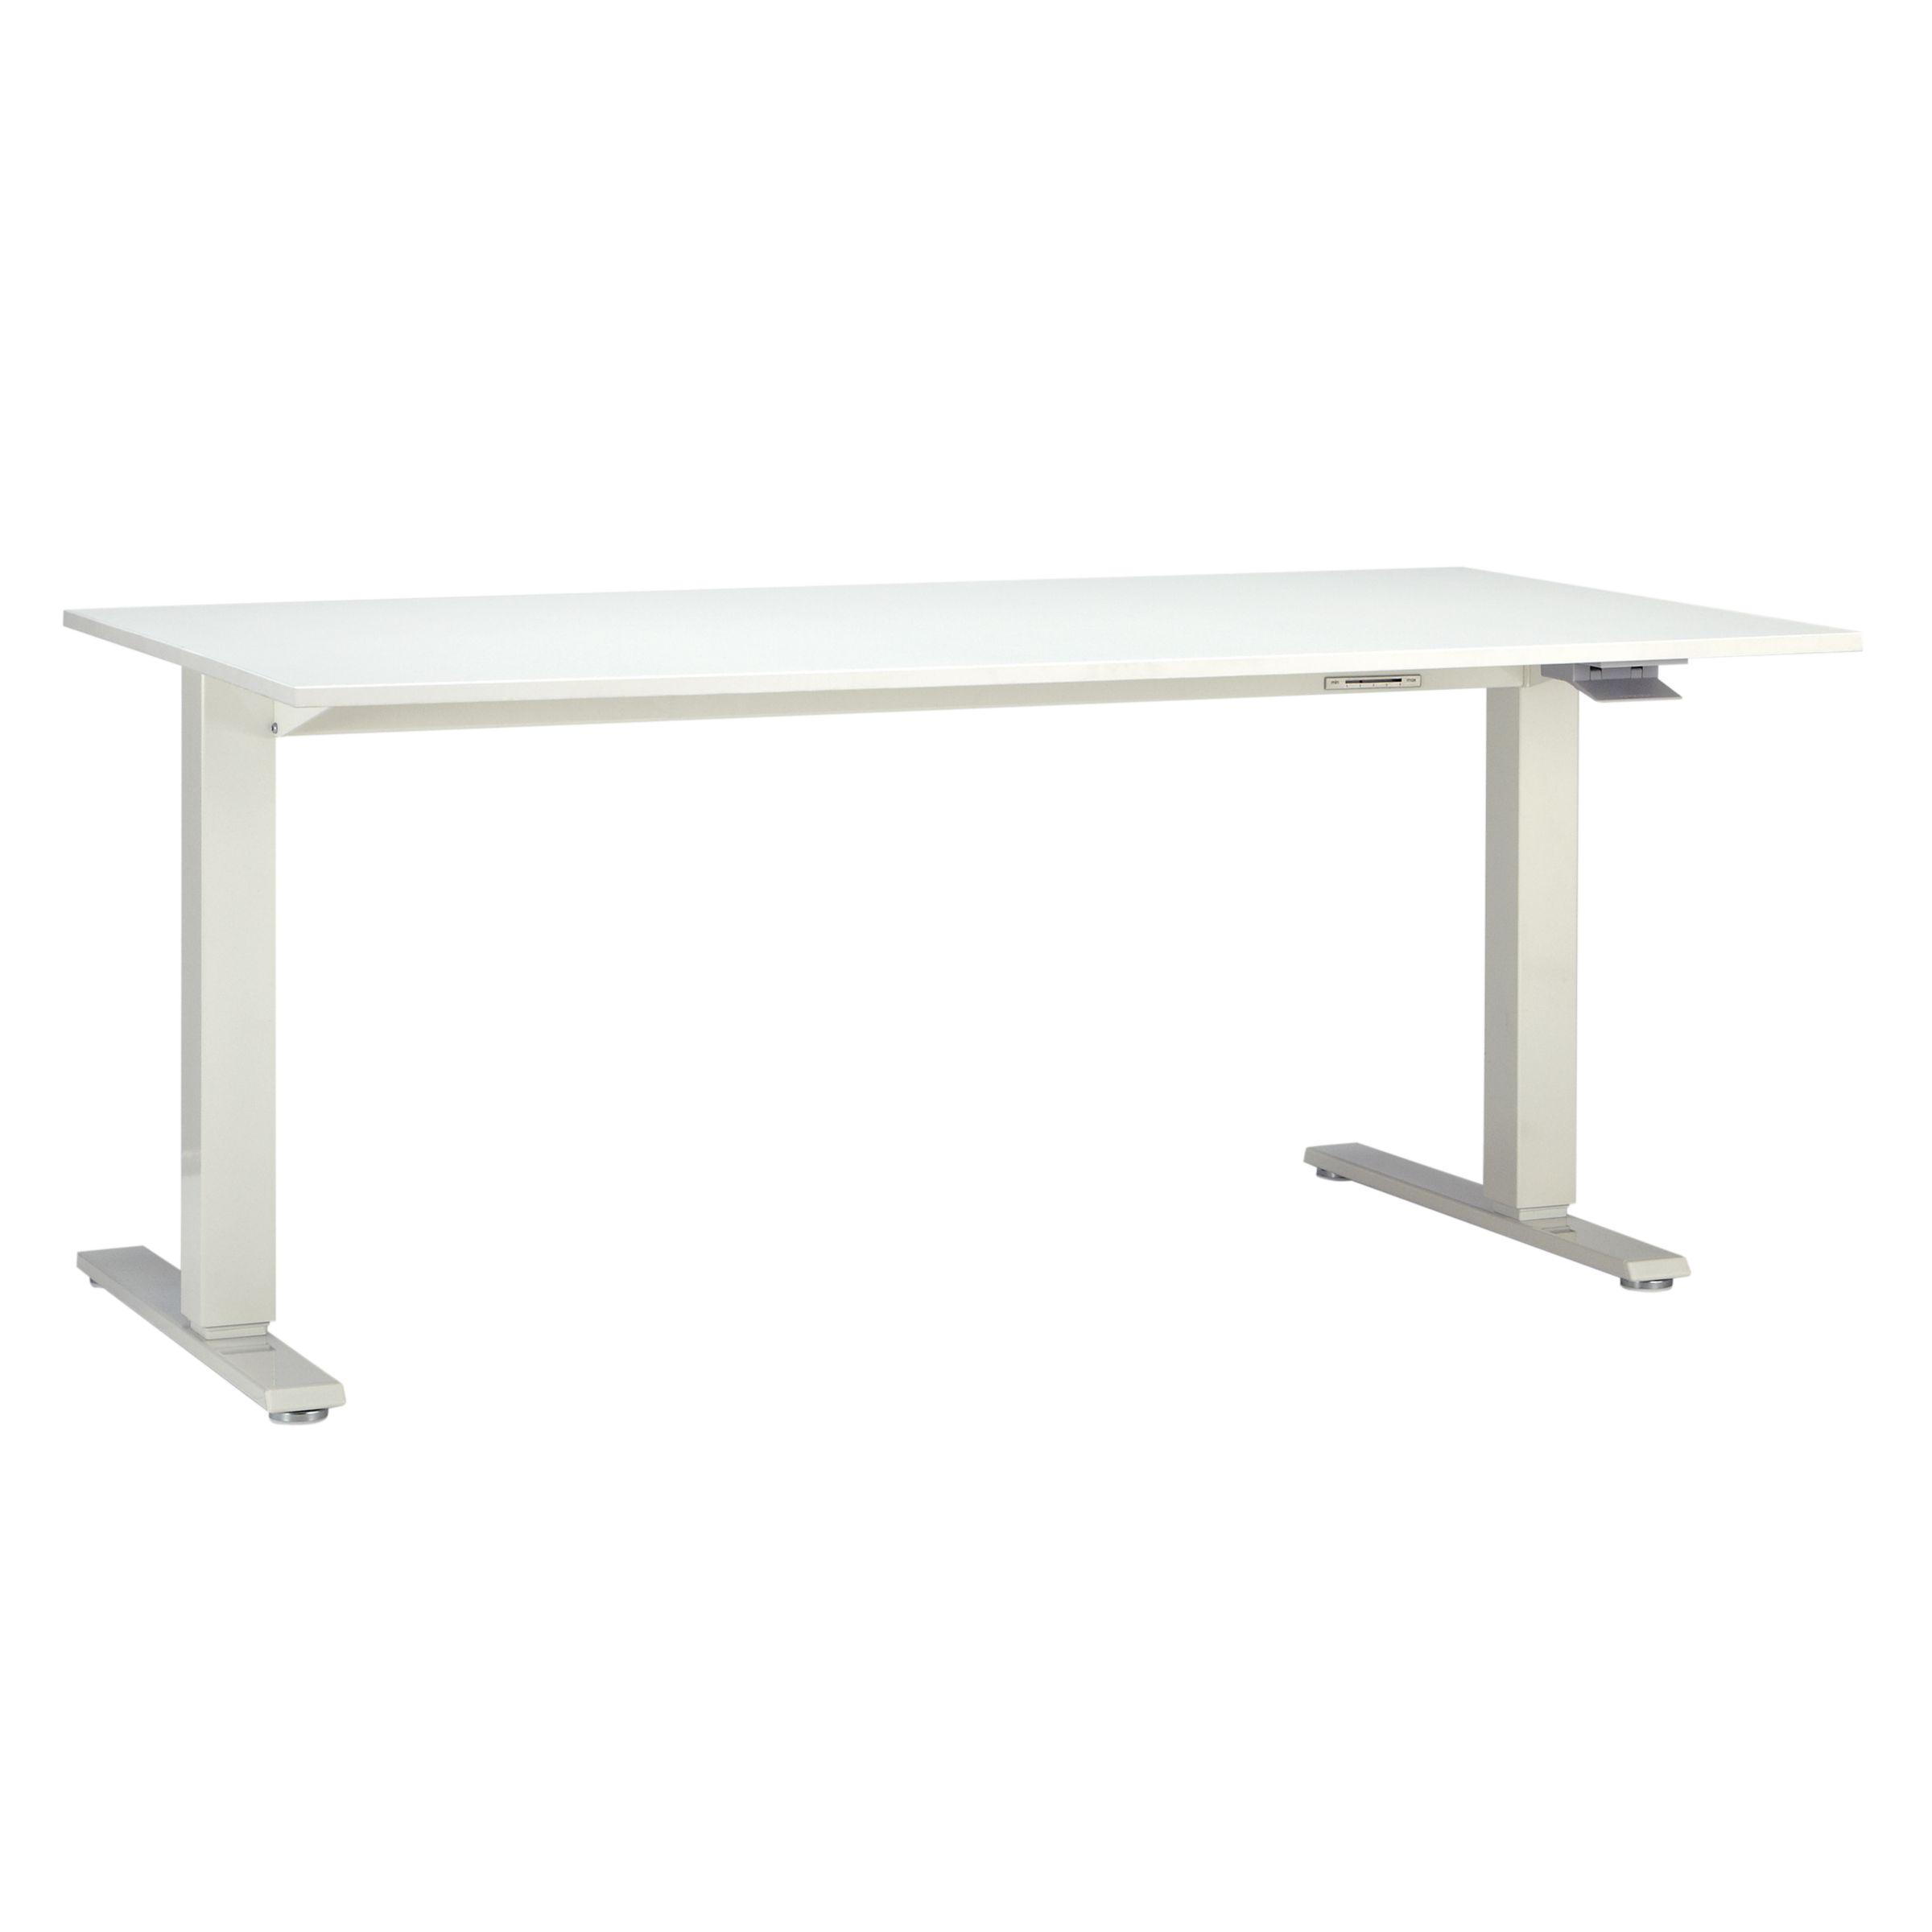 Humanscale Humanscale Float Height Adjustable Desk